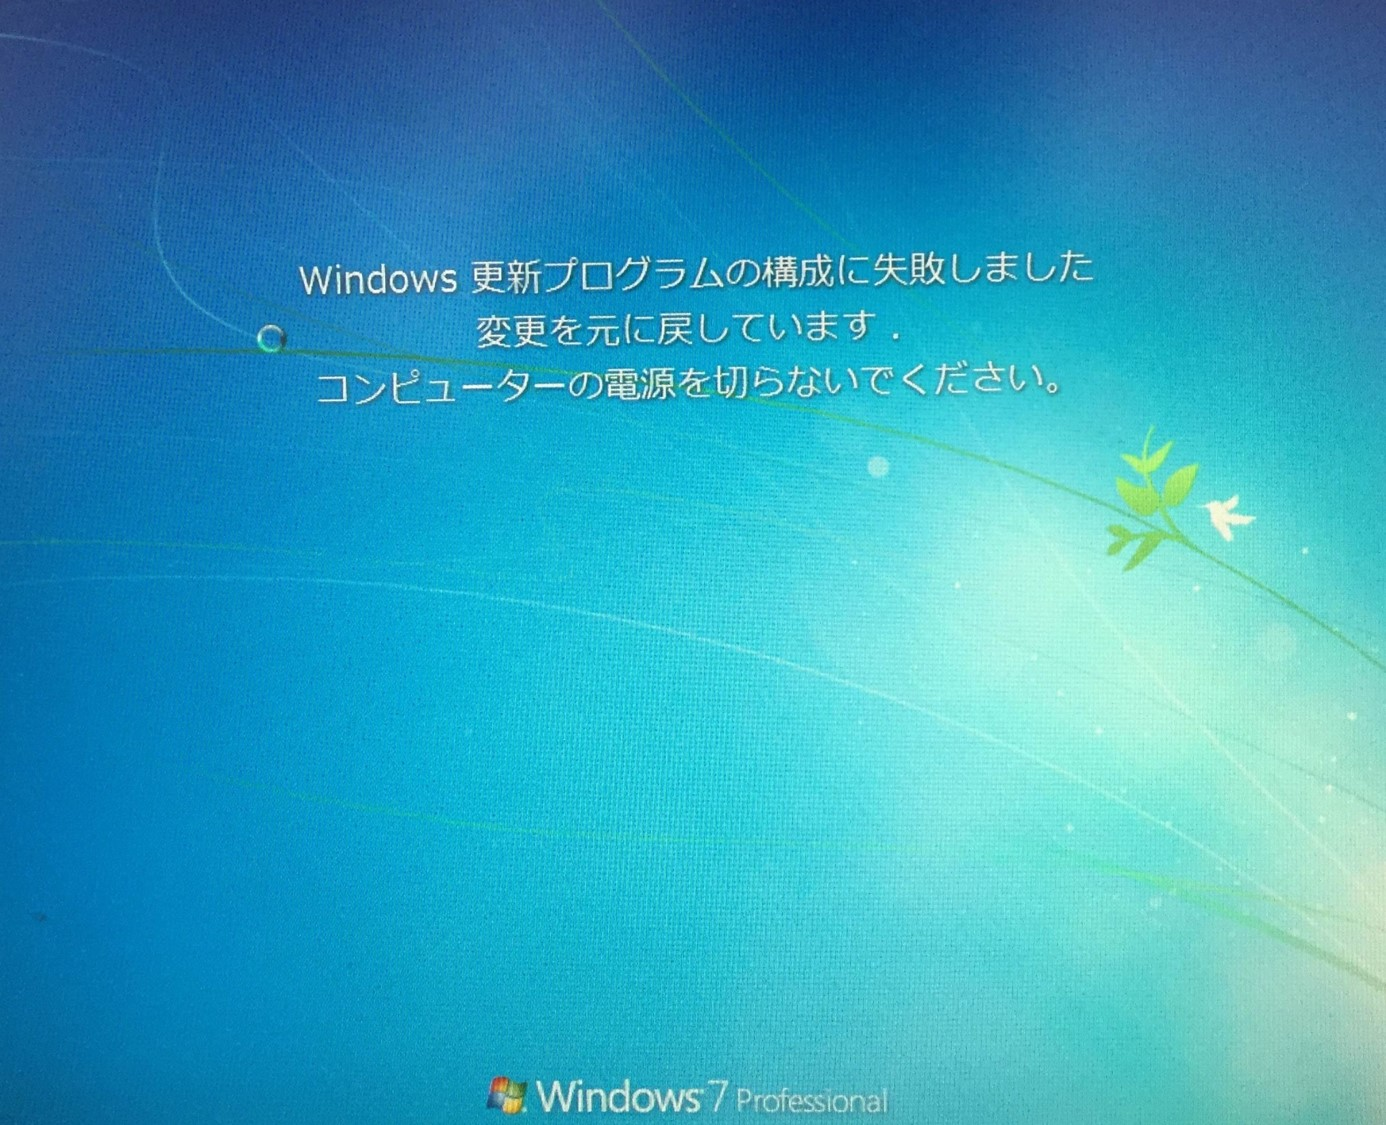 Windows更新プログラムの構成に失敗しました・・・画面